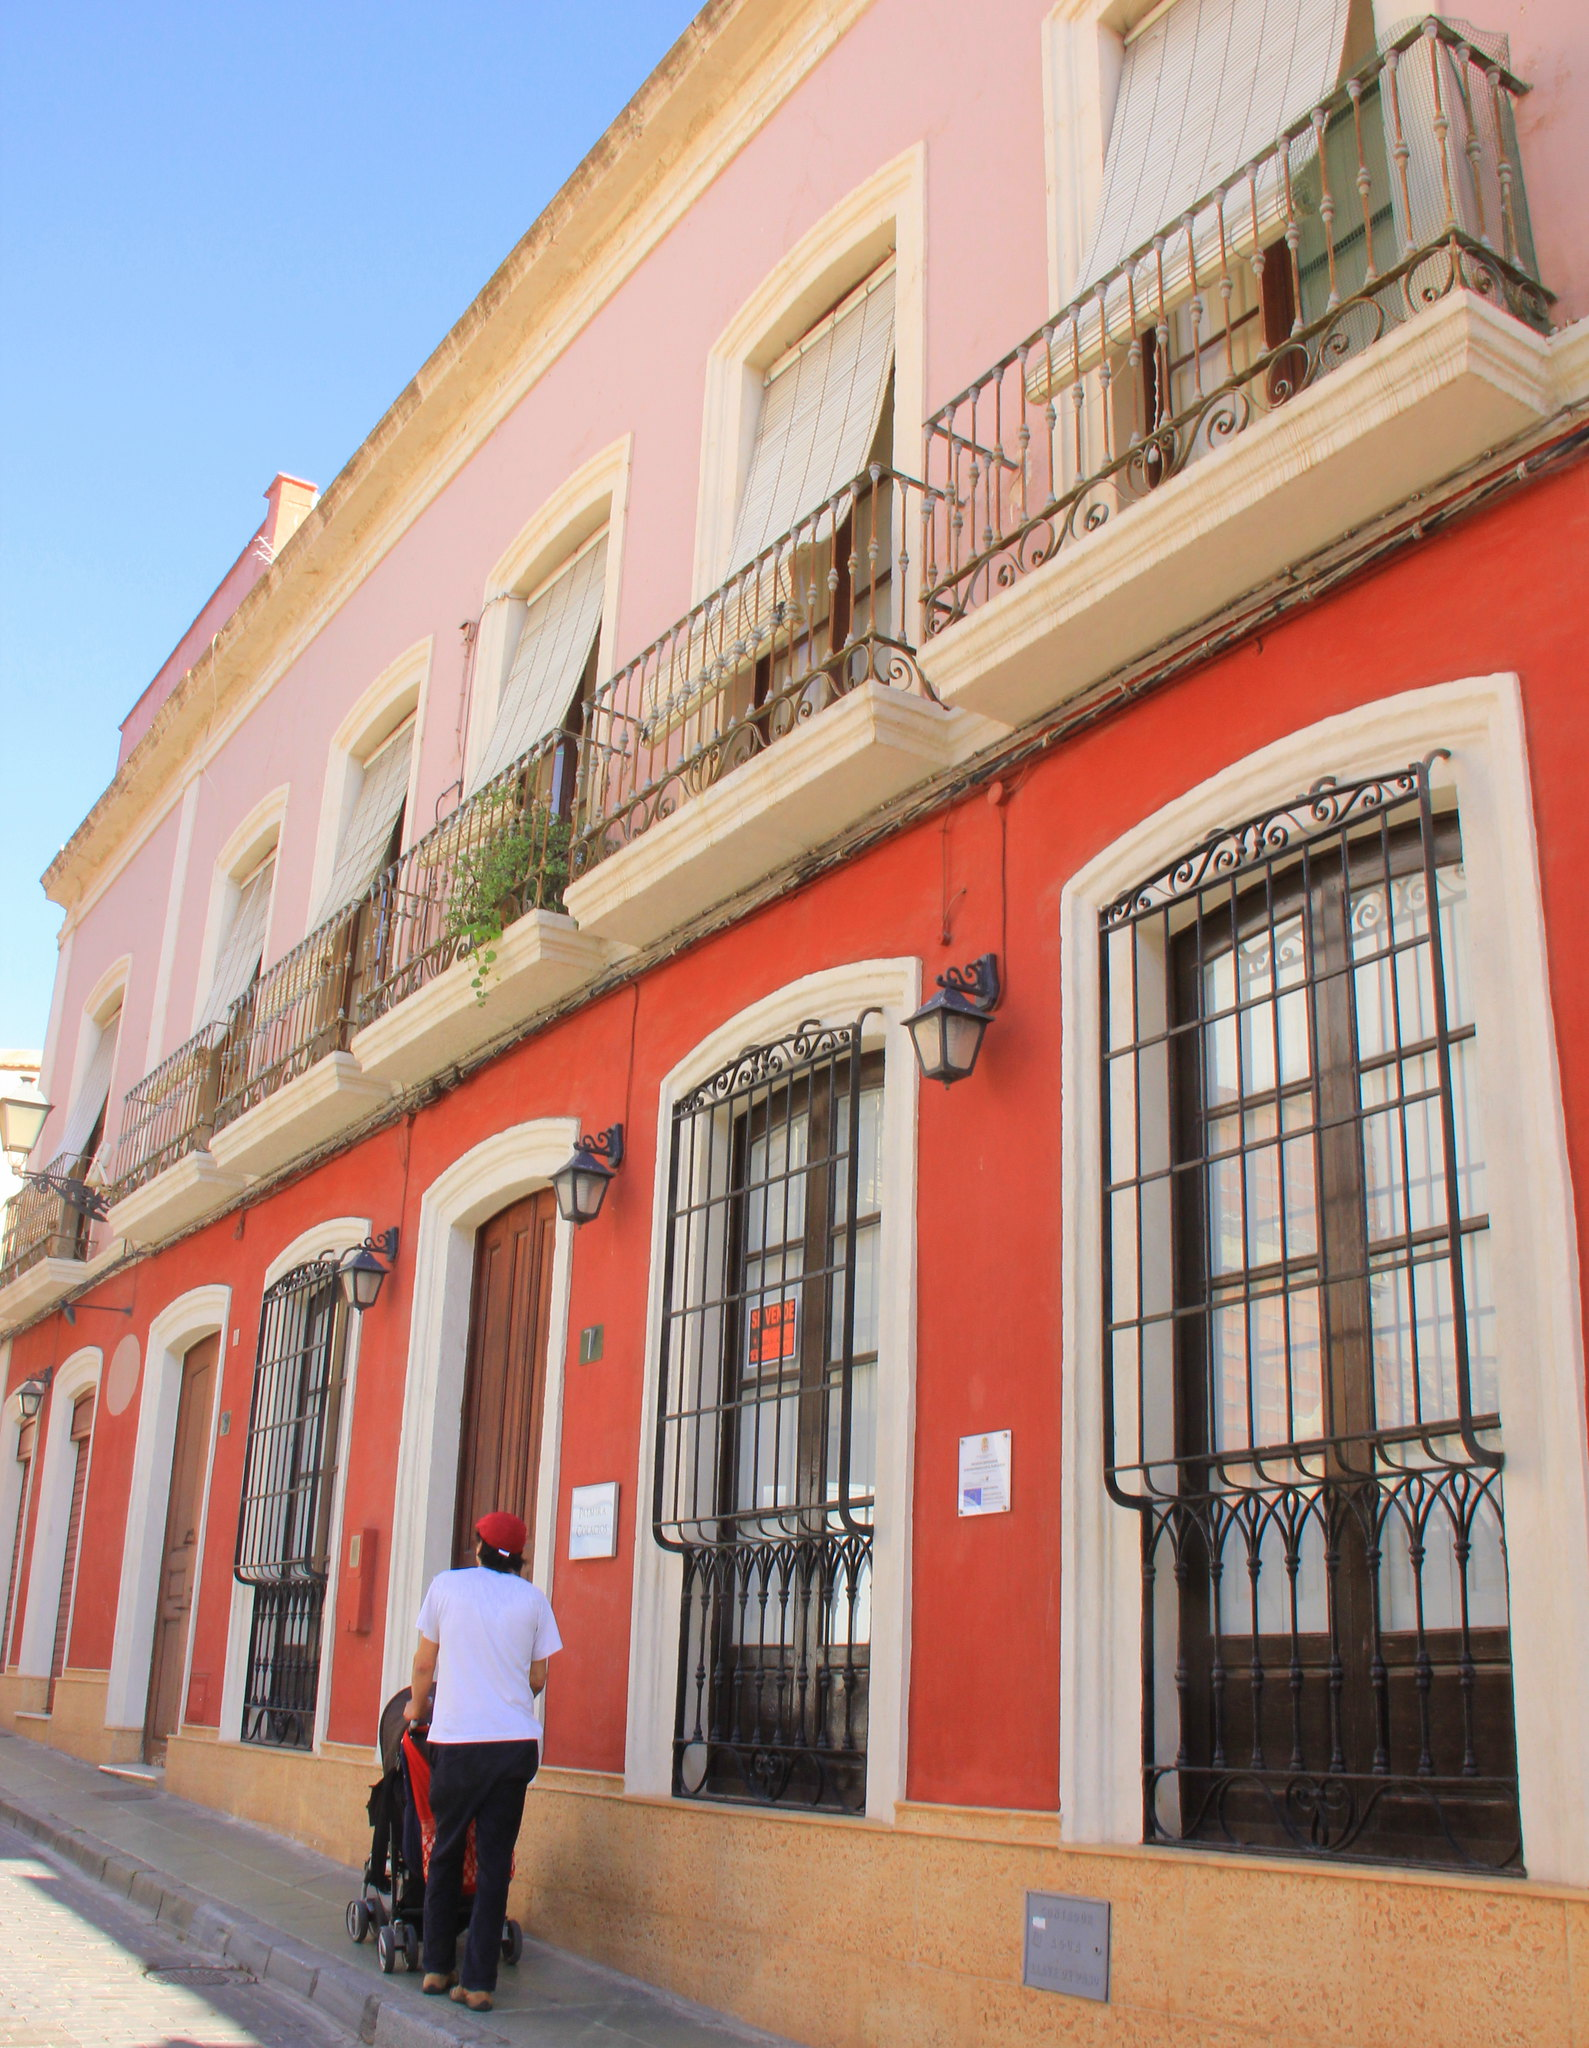 Almeria old town is pleasant to walk around